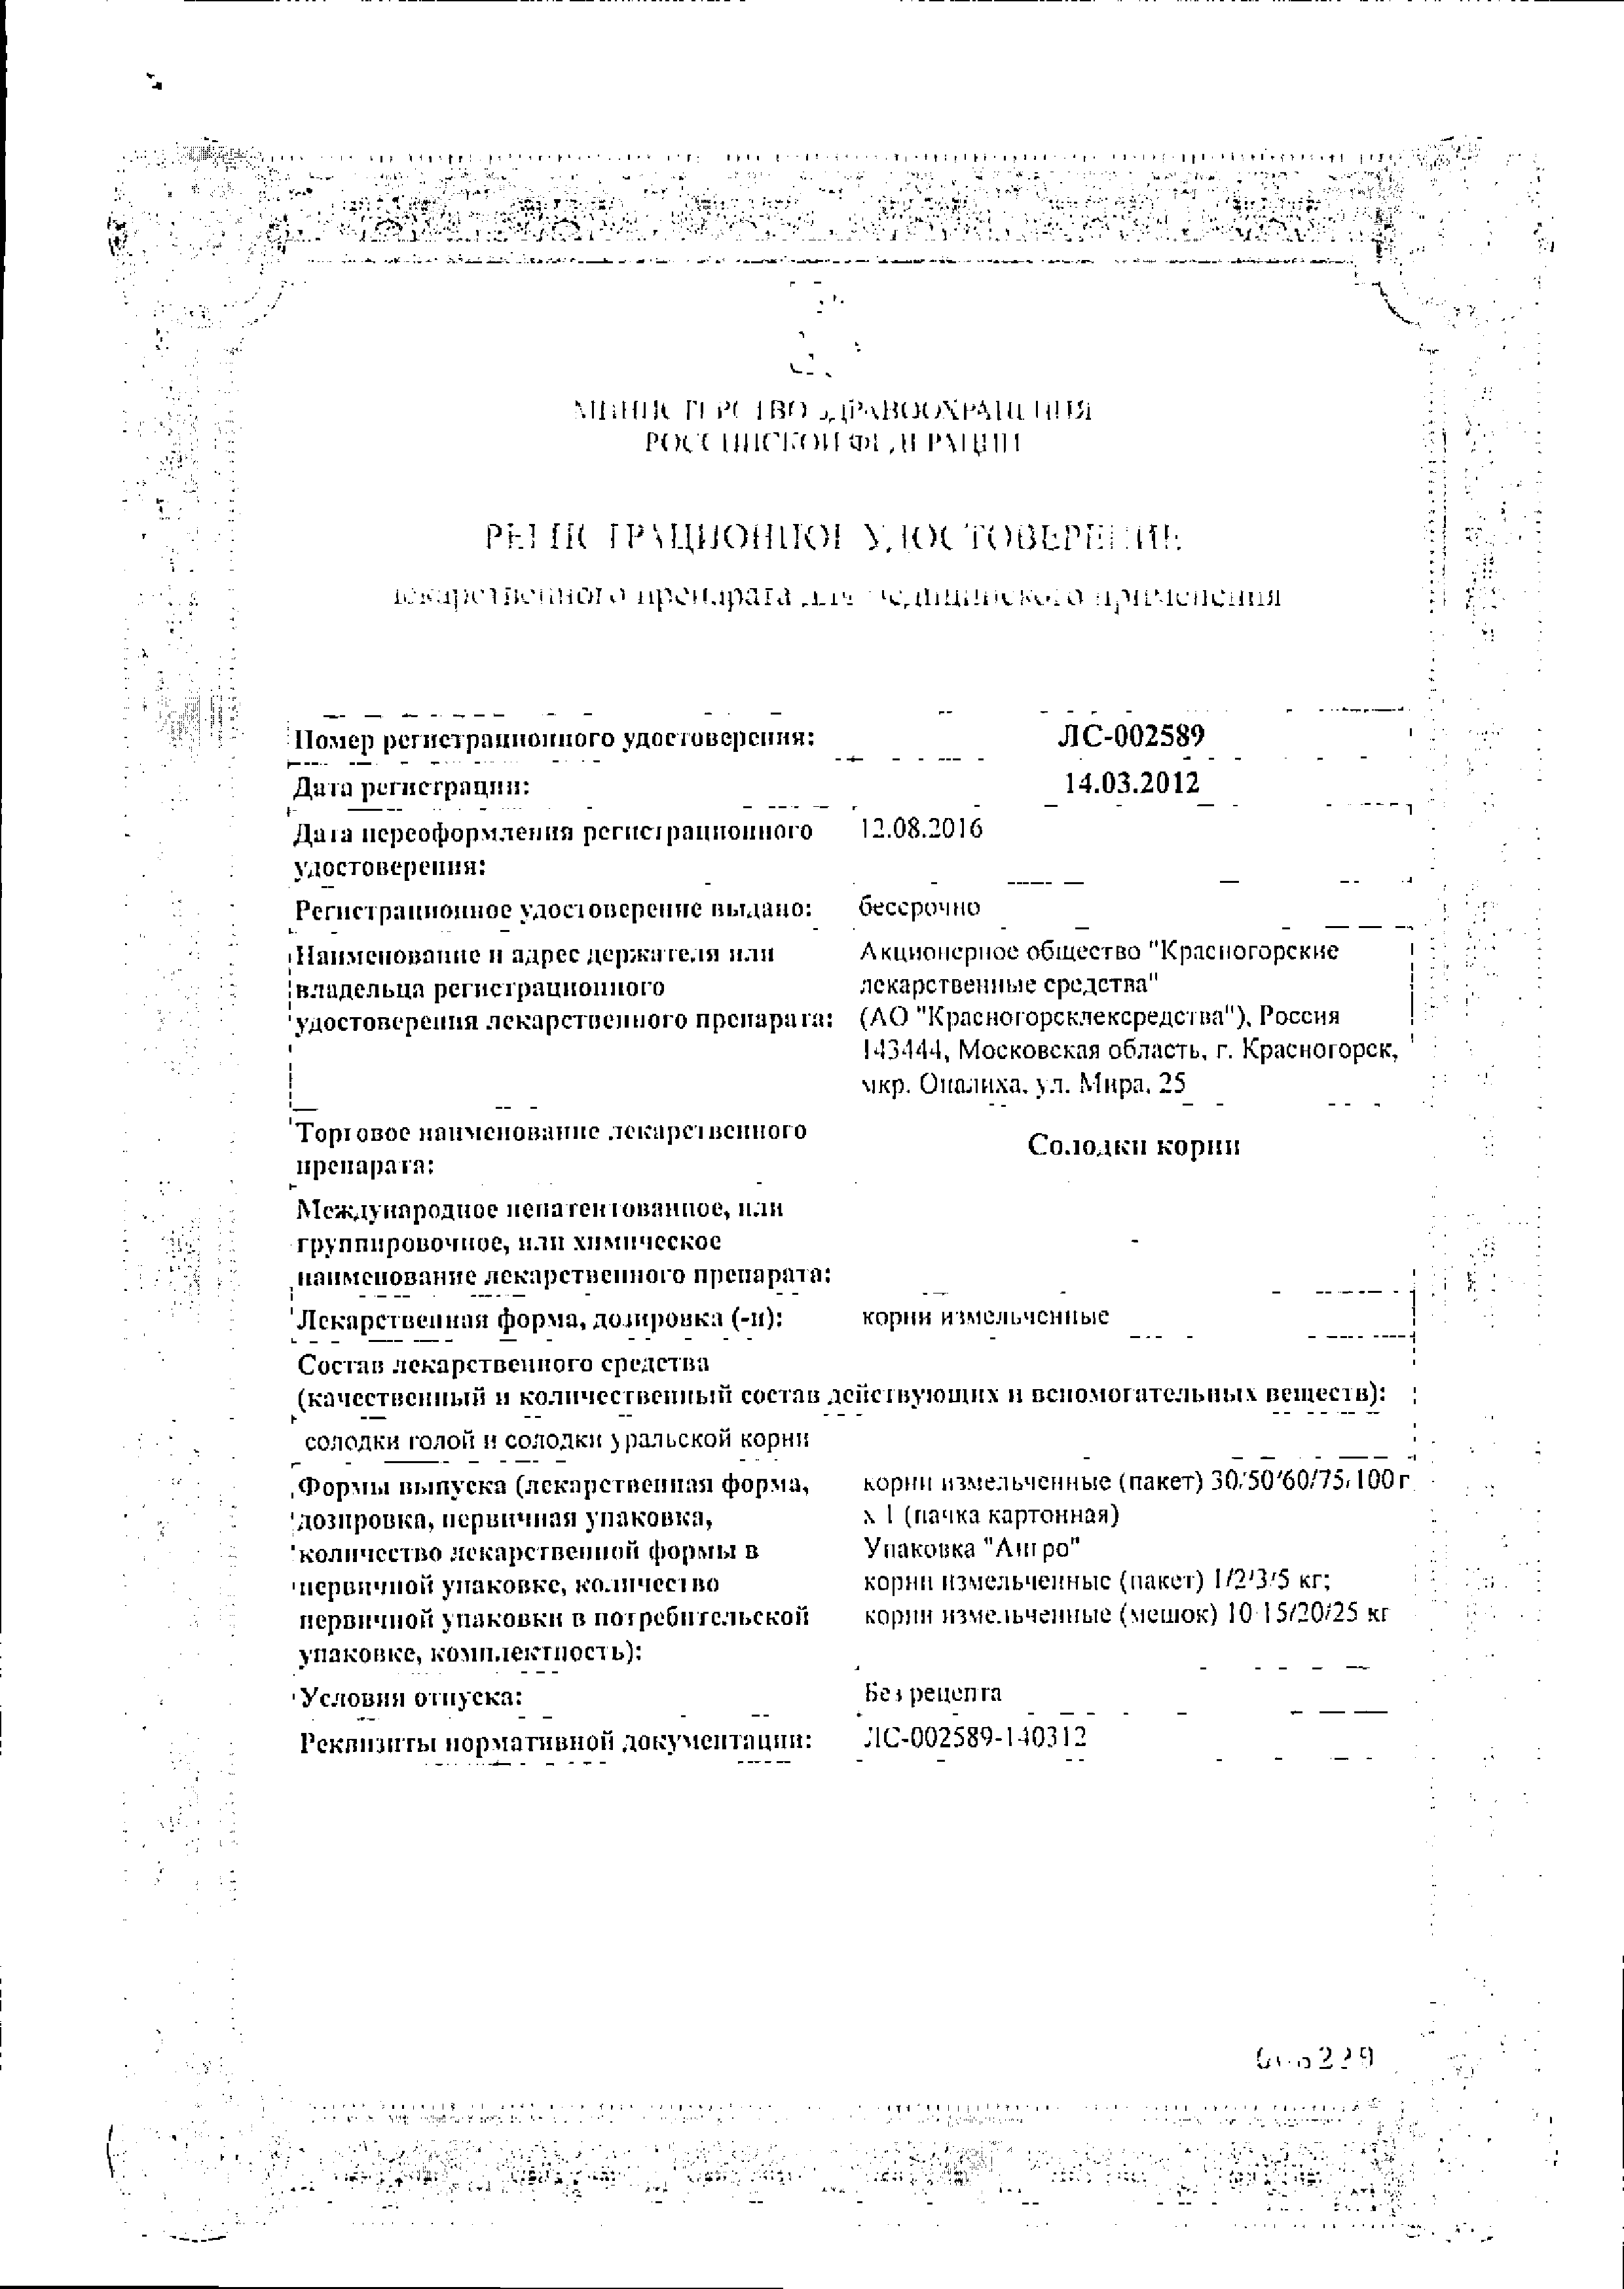 Солодки корни сертификат